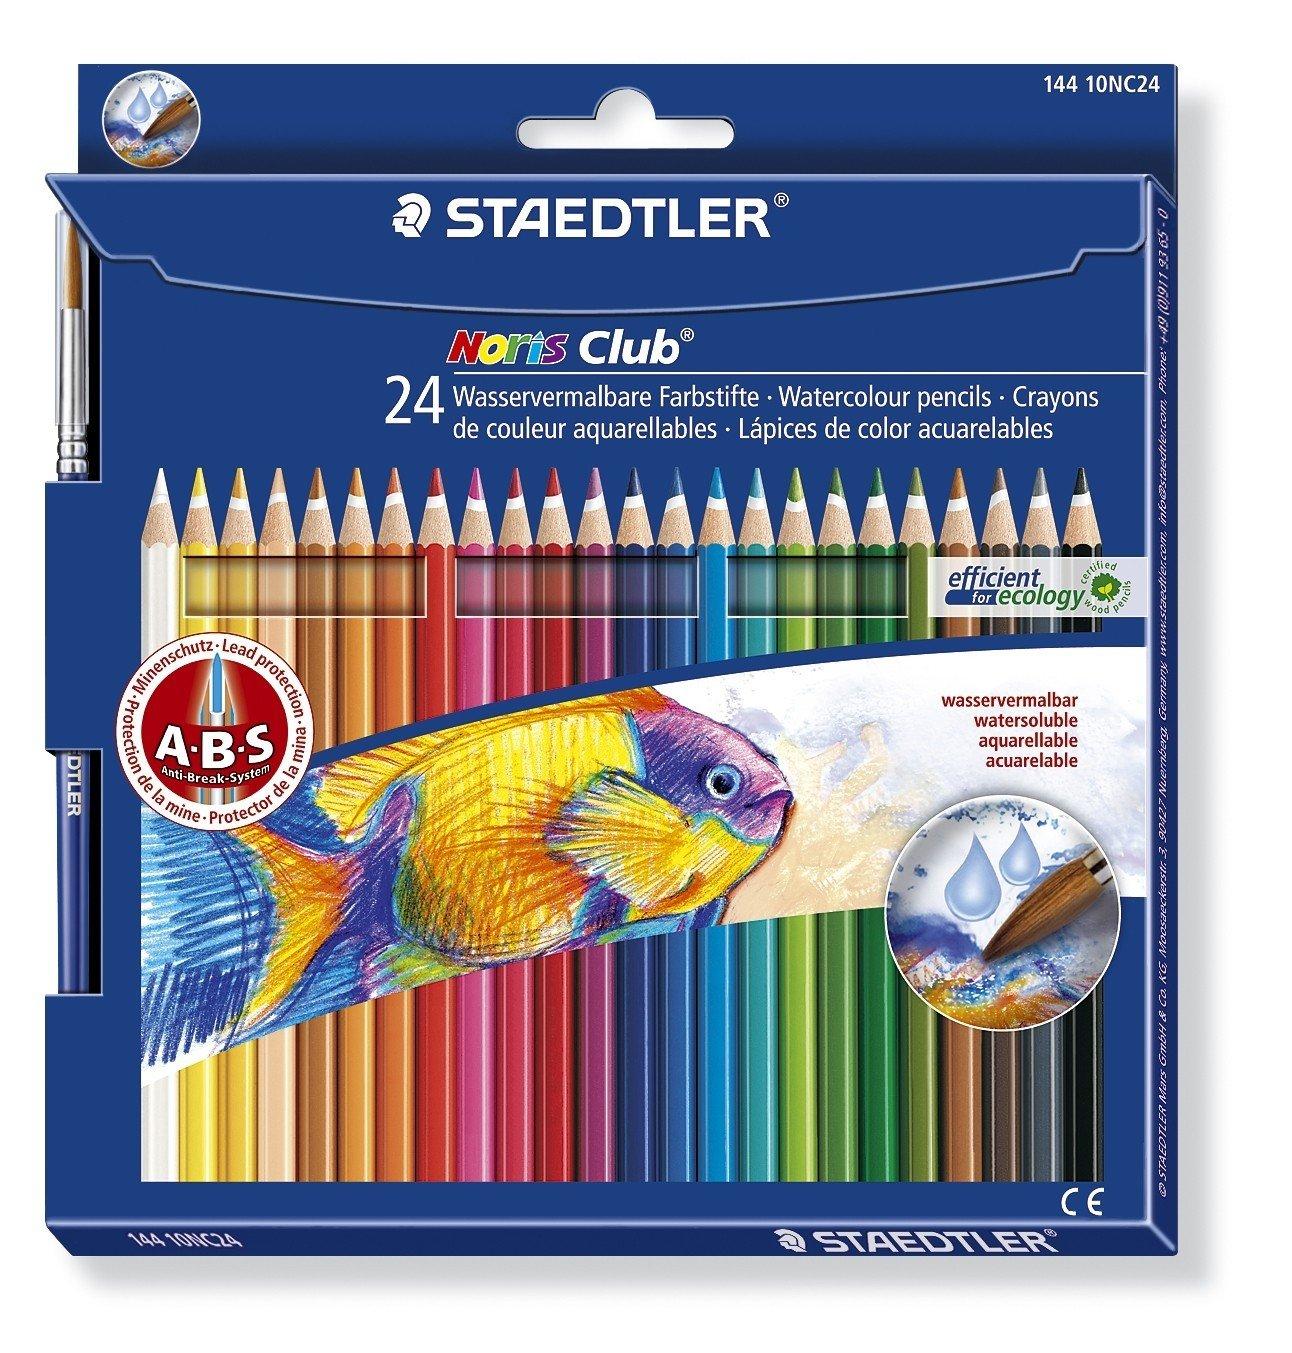 crayon aquarelle staedtler